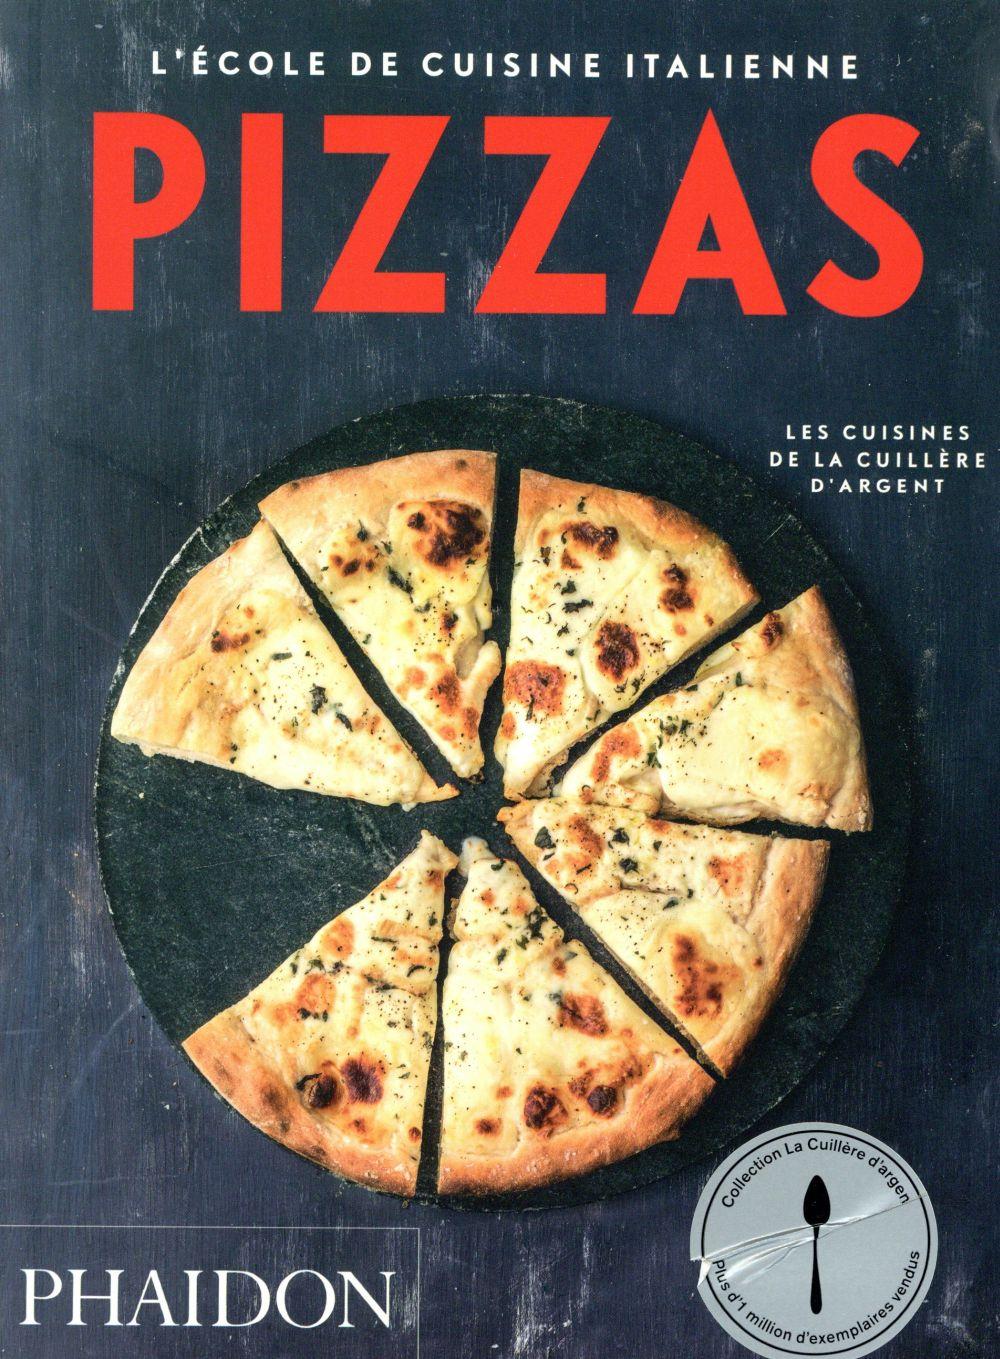 ECOLE DE CUISINE ITALIENNE PIZZAS